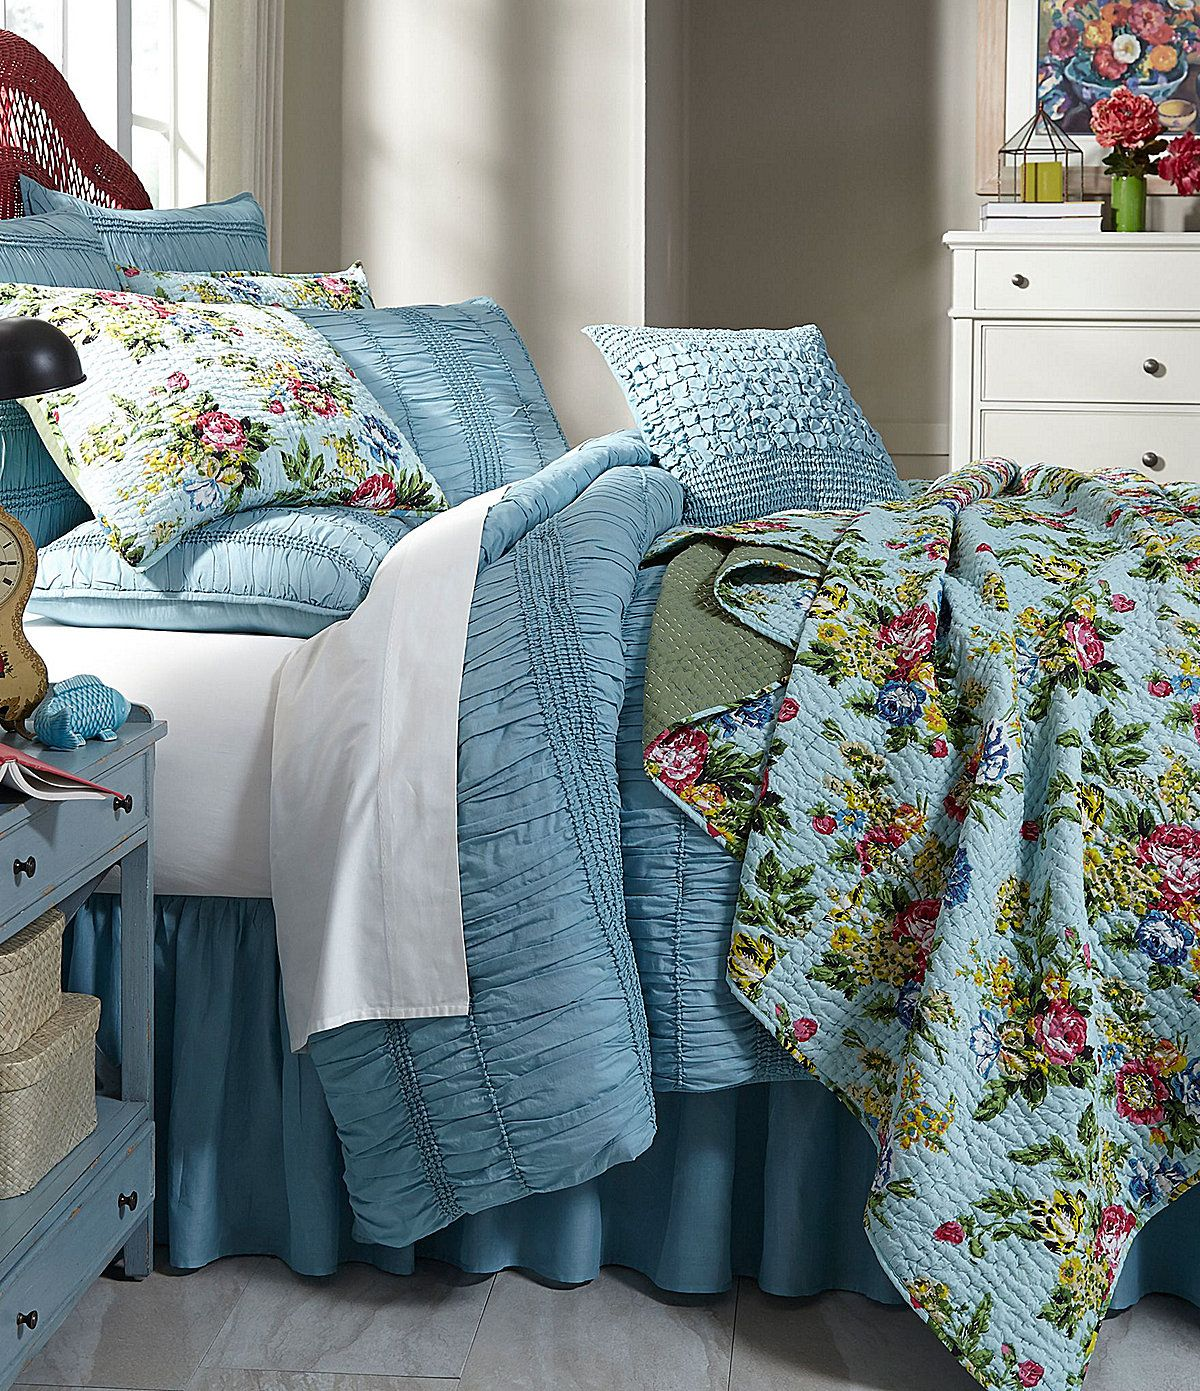 Dillards Home Decor: Studio D Mara Quilt Mini Bedding Collection